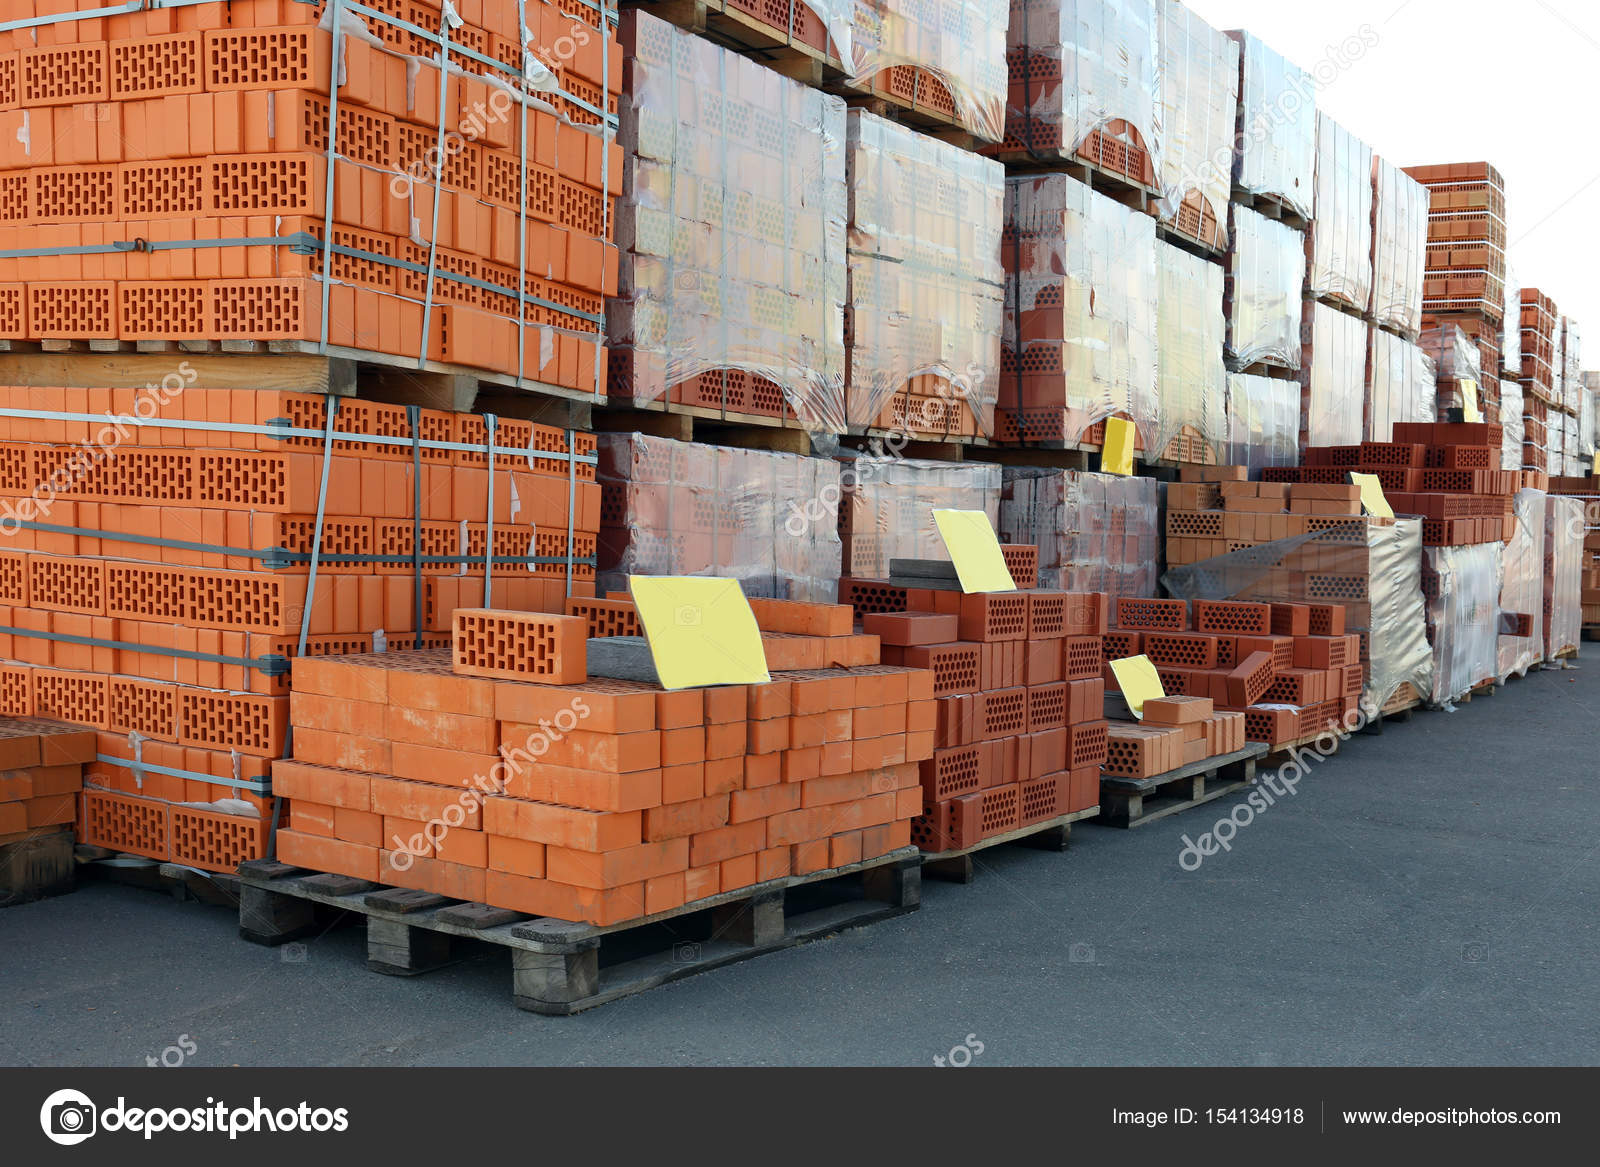 bccd0132343d Τούβλα για χονδρική πώληση — Φωτογραφία Αρχείου © belchonock #154134918